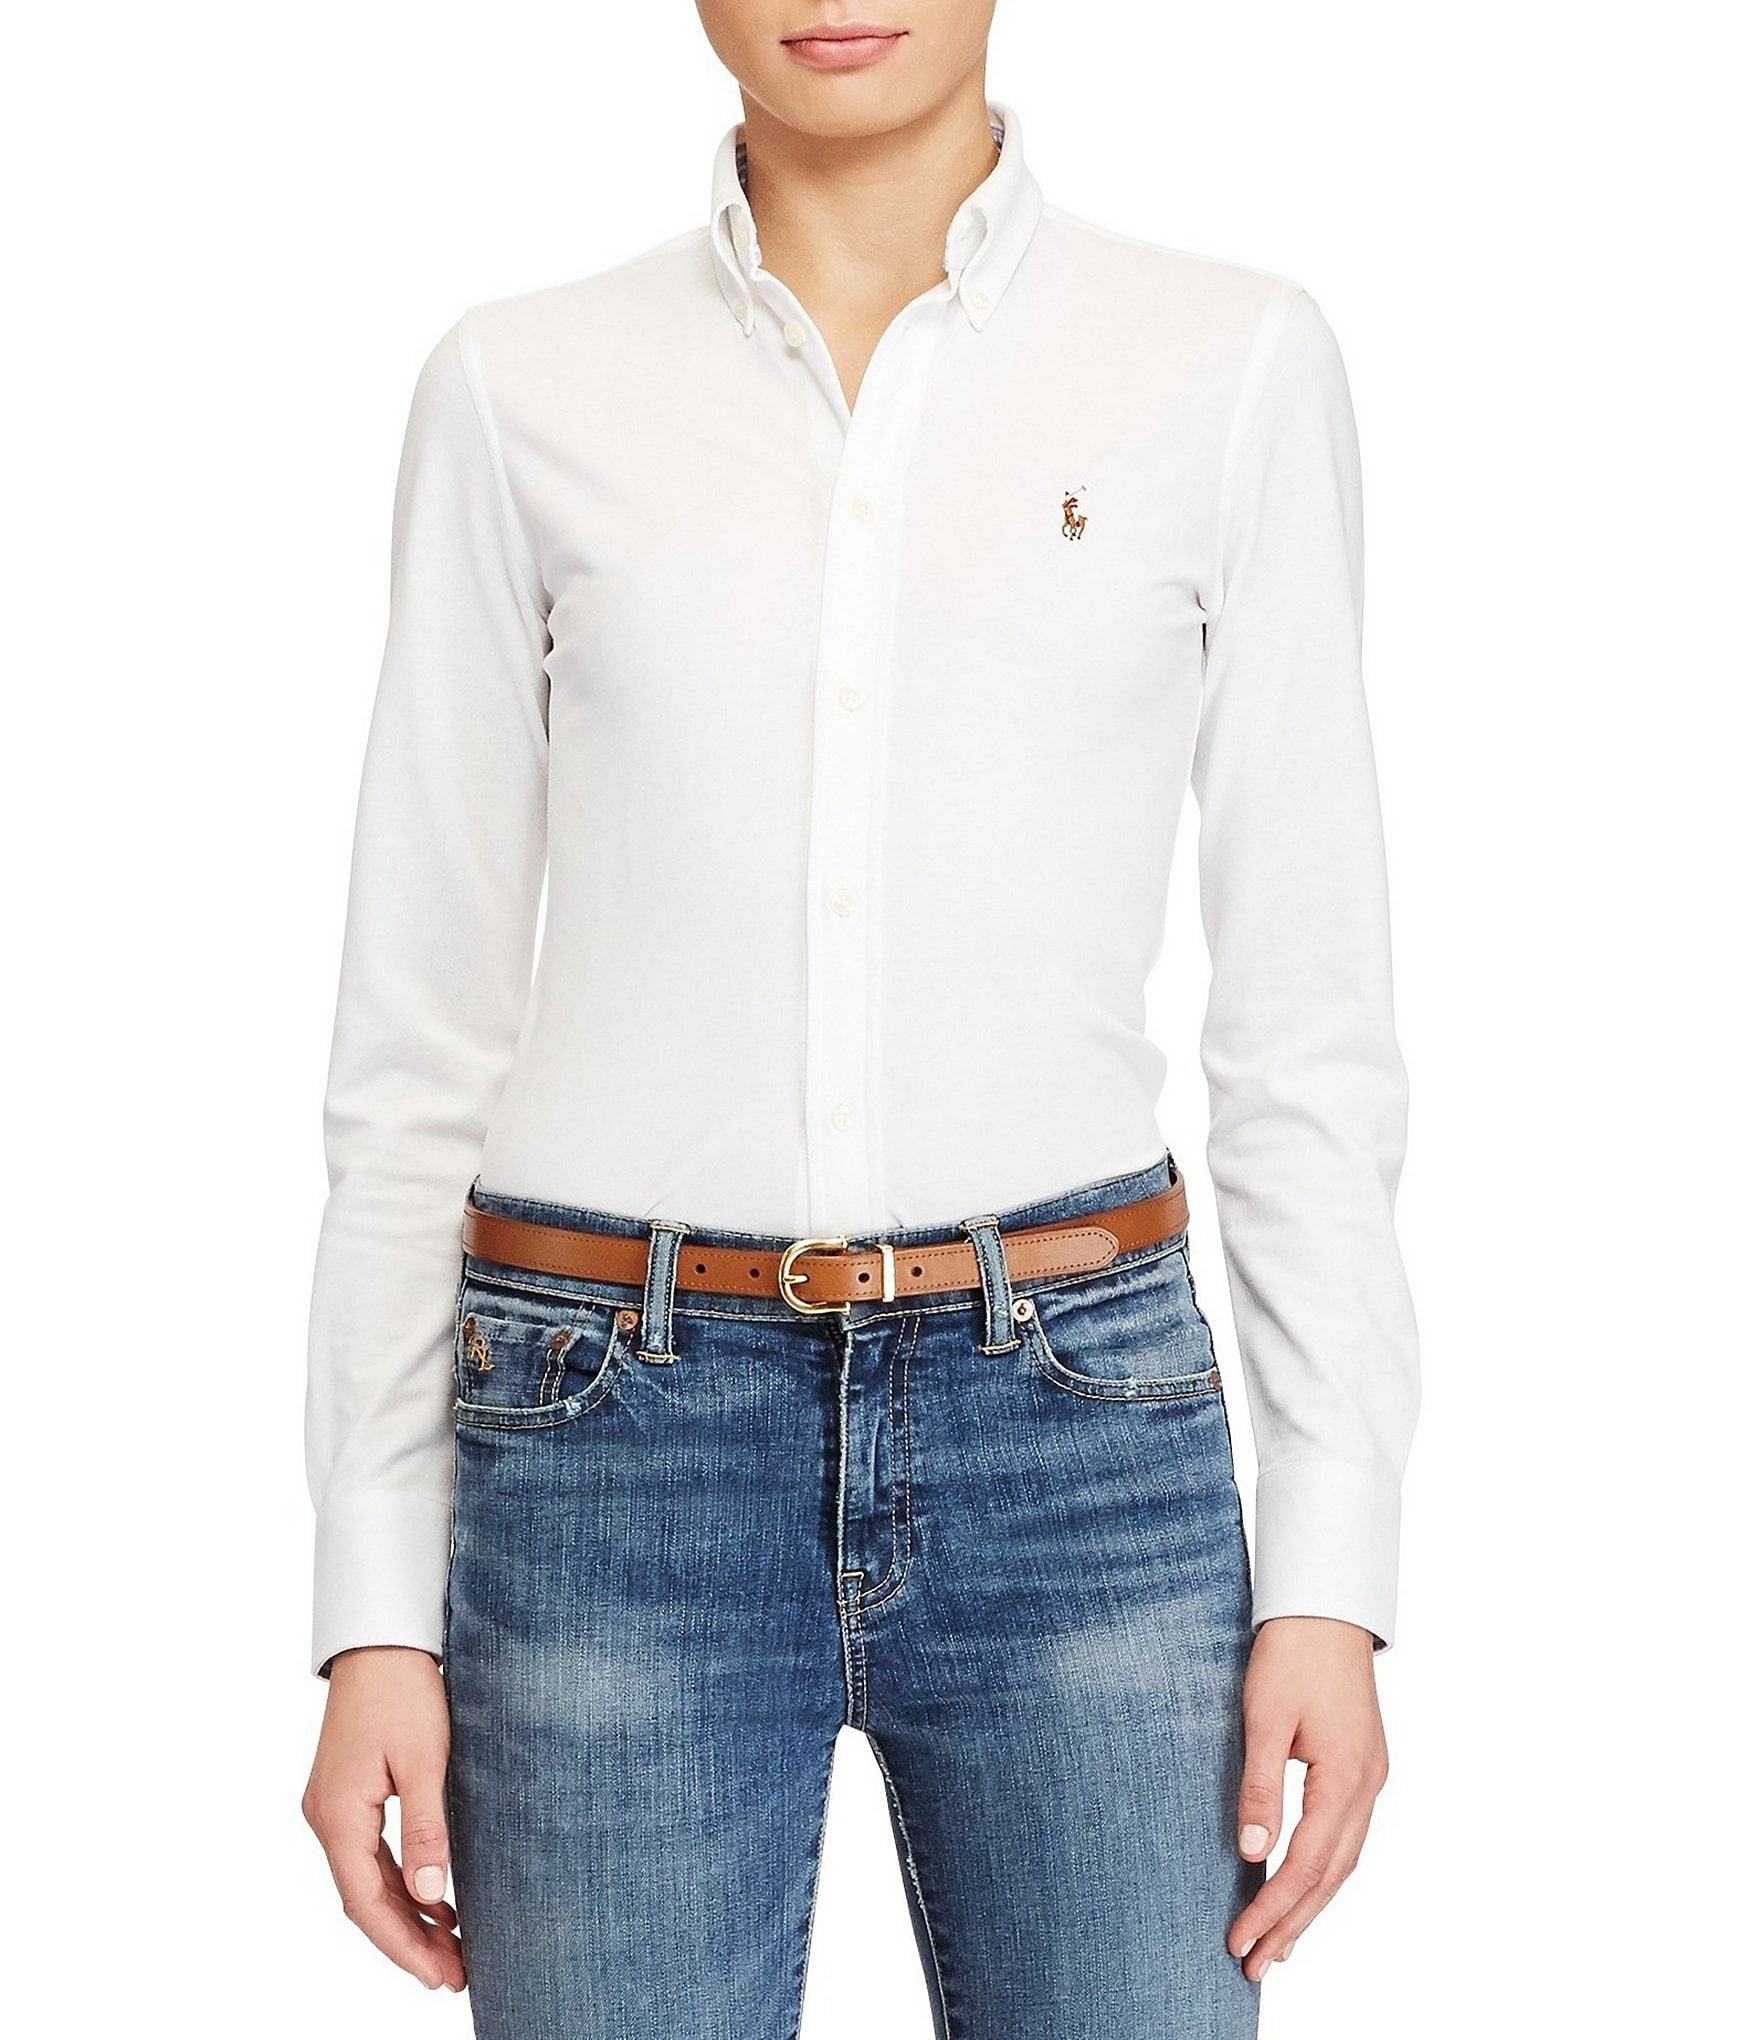 Polo Ralph Lauren Classic Signature Pony Knit Oxford Shirt